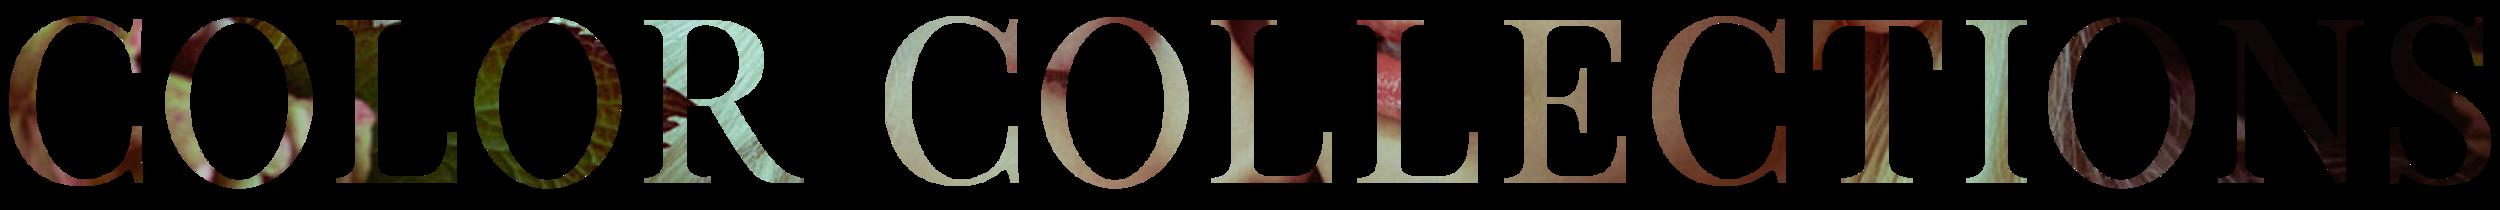 Title Design.png